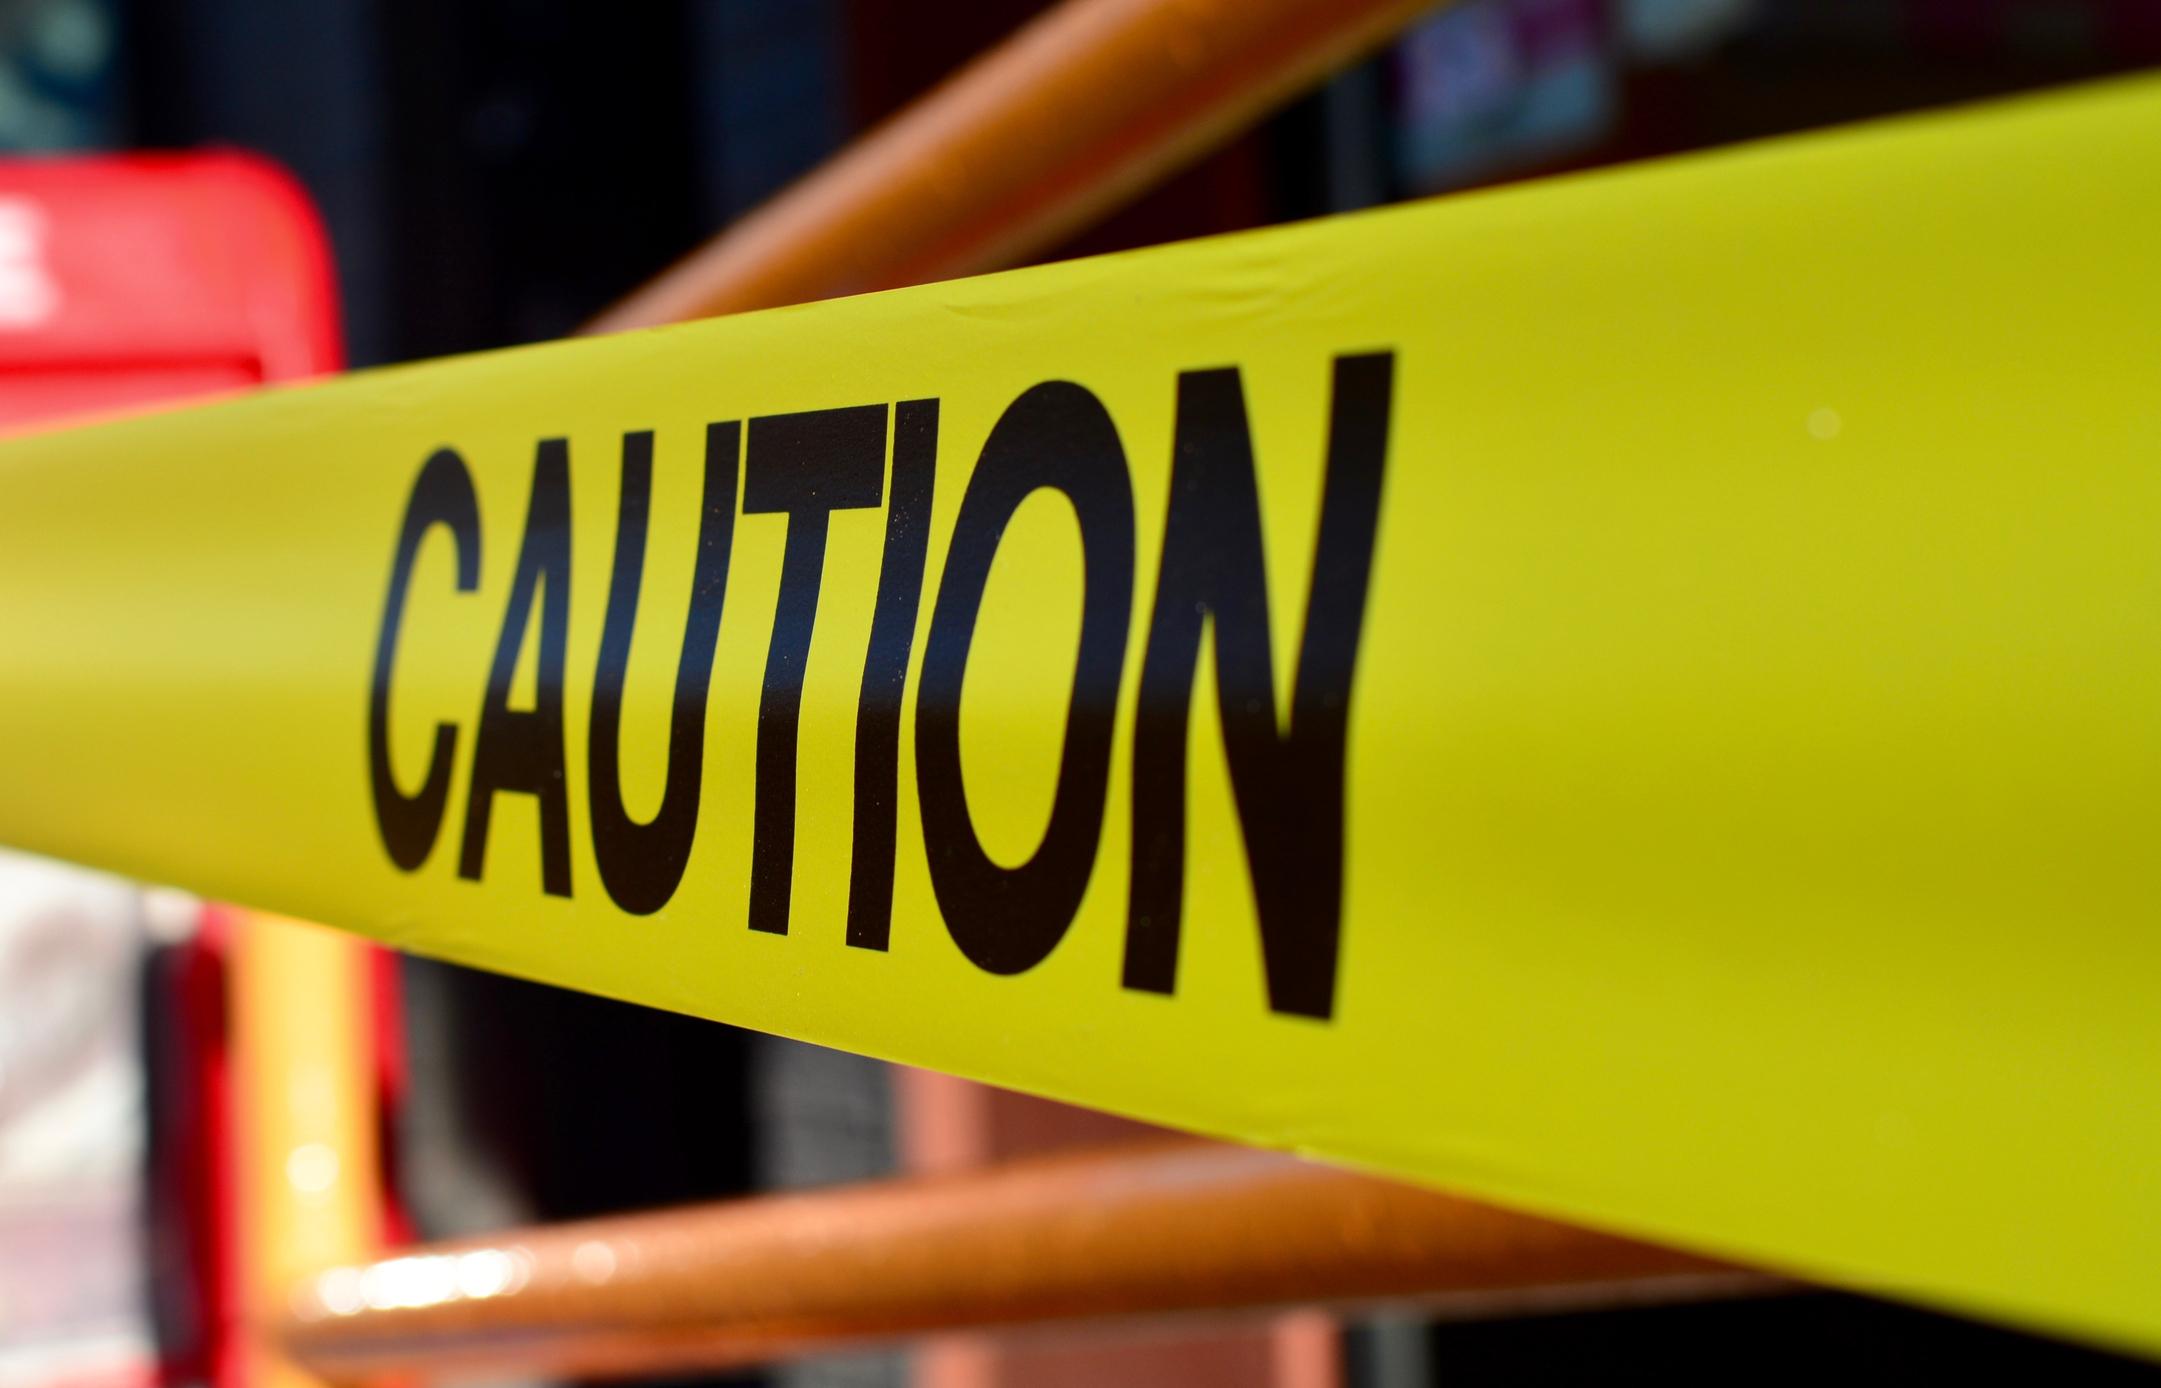 Caution tape.